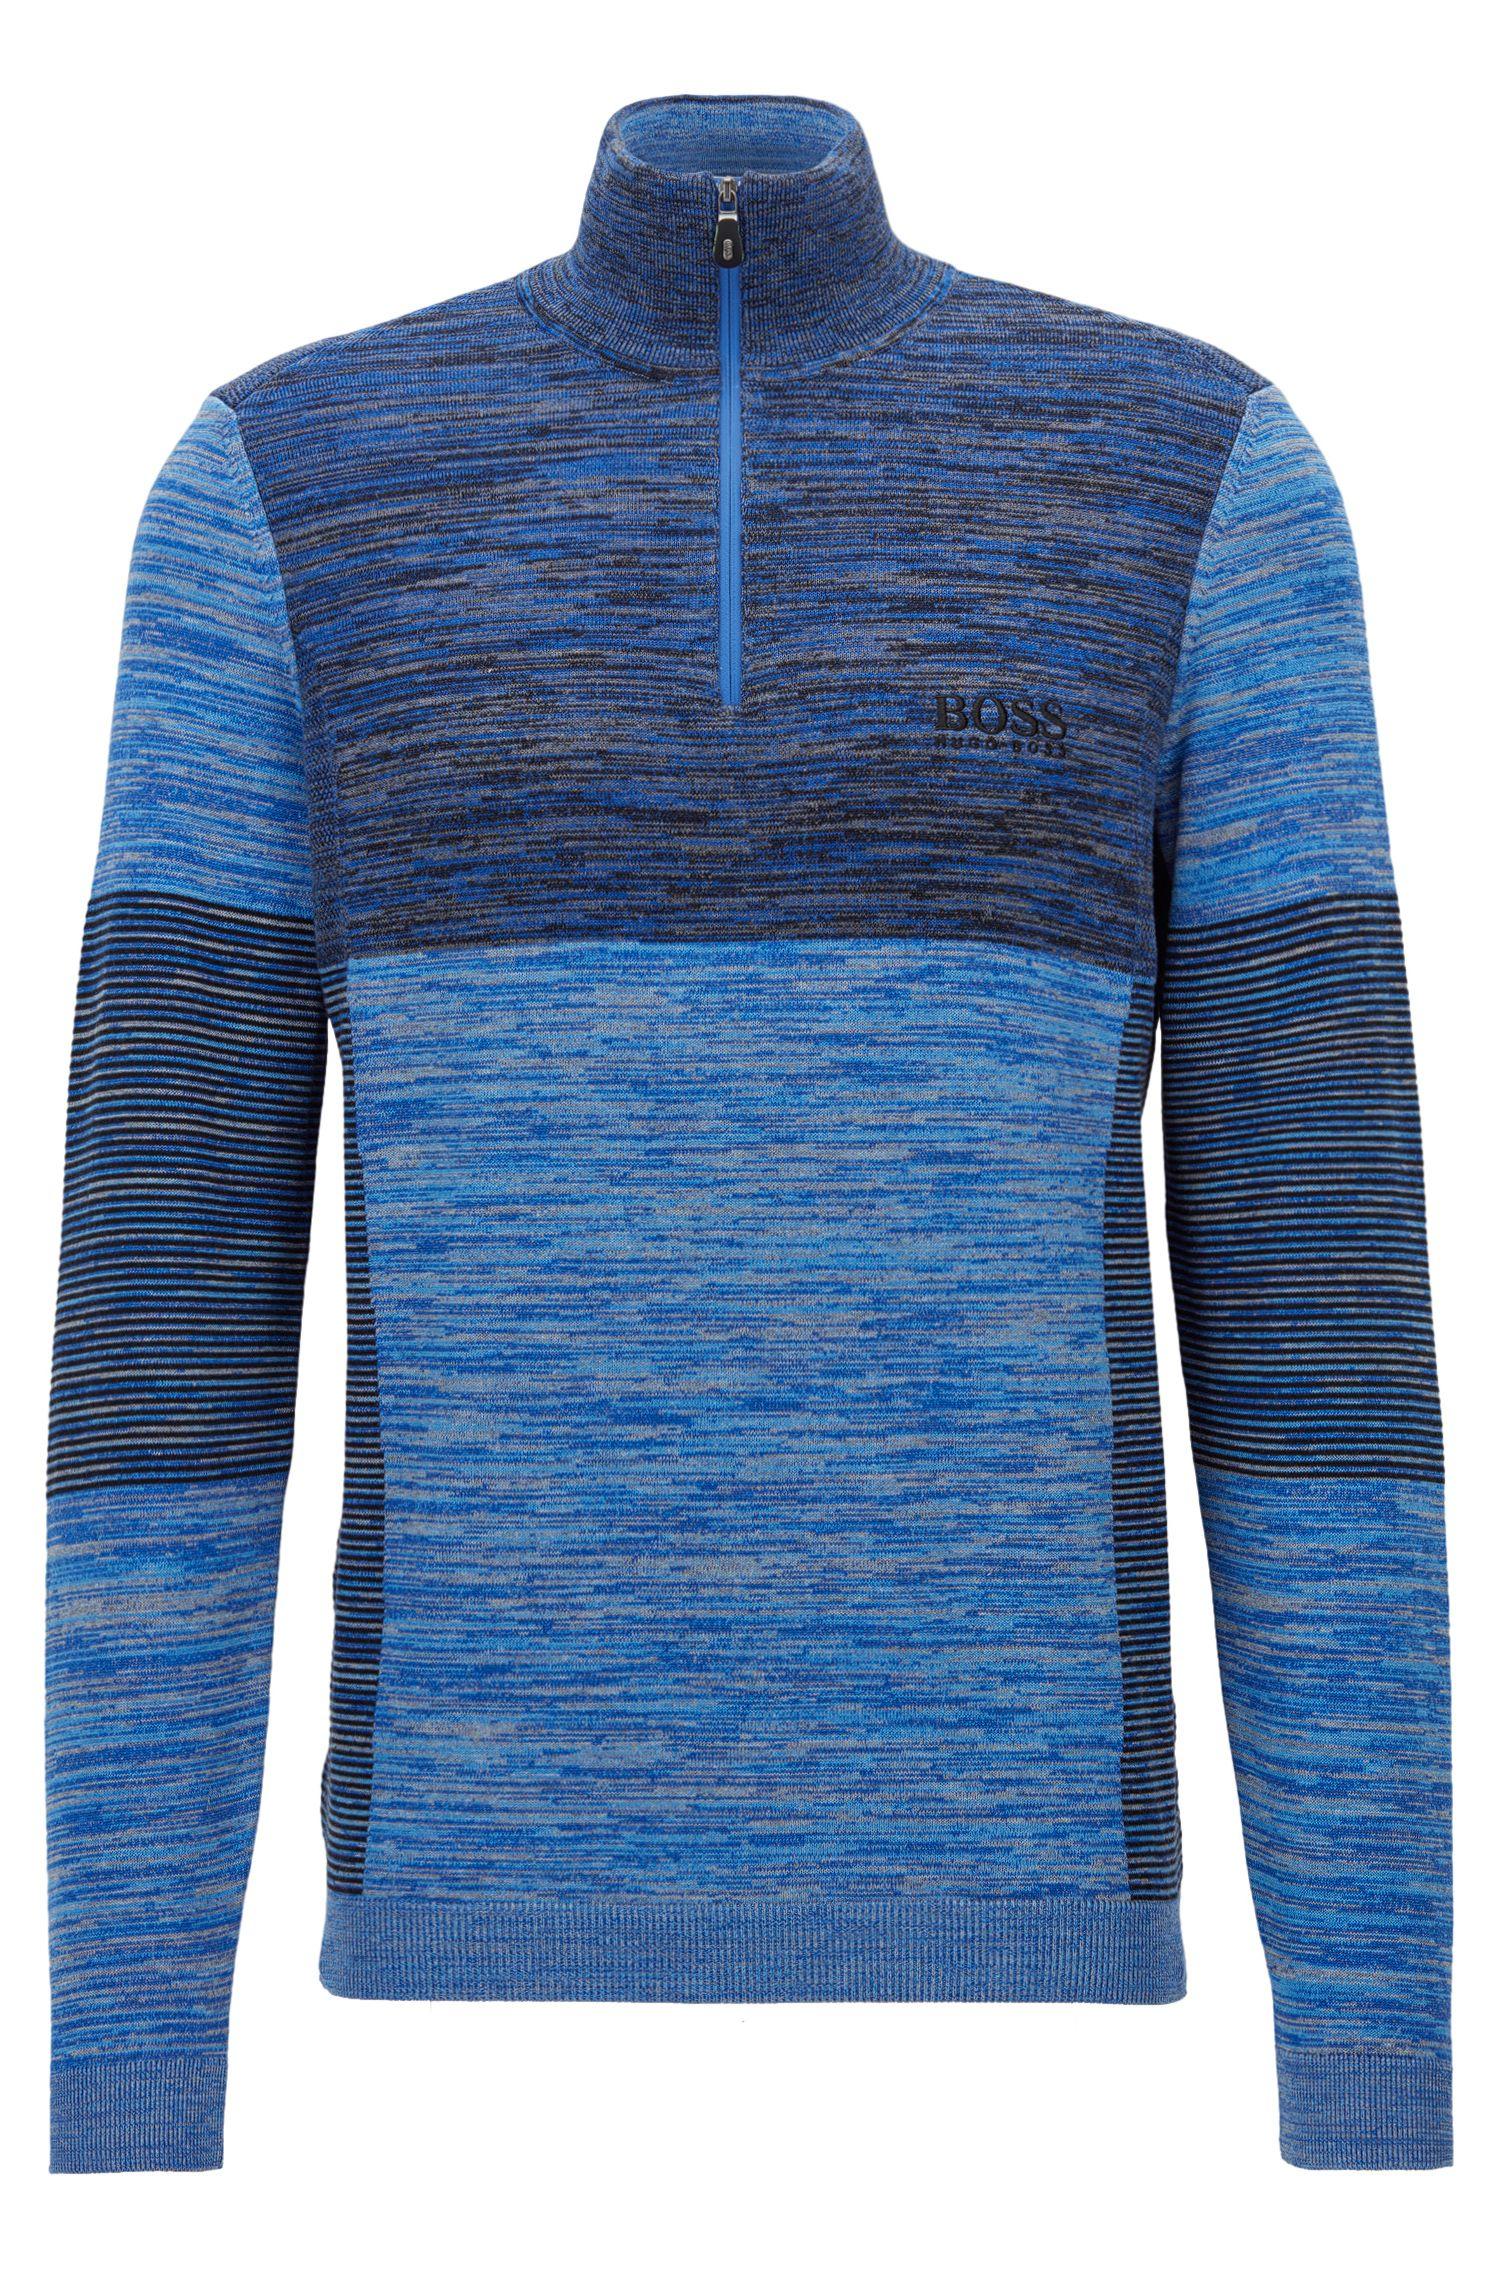 Colorblocked Melange Stretch Cotton Half-Zip Sweater | Zadok Pro